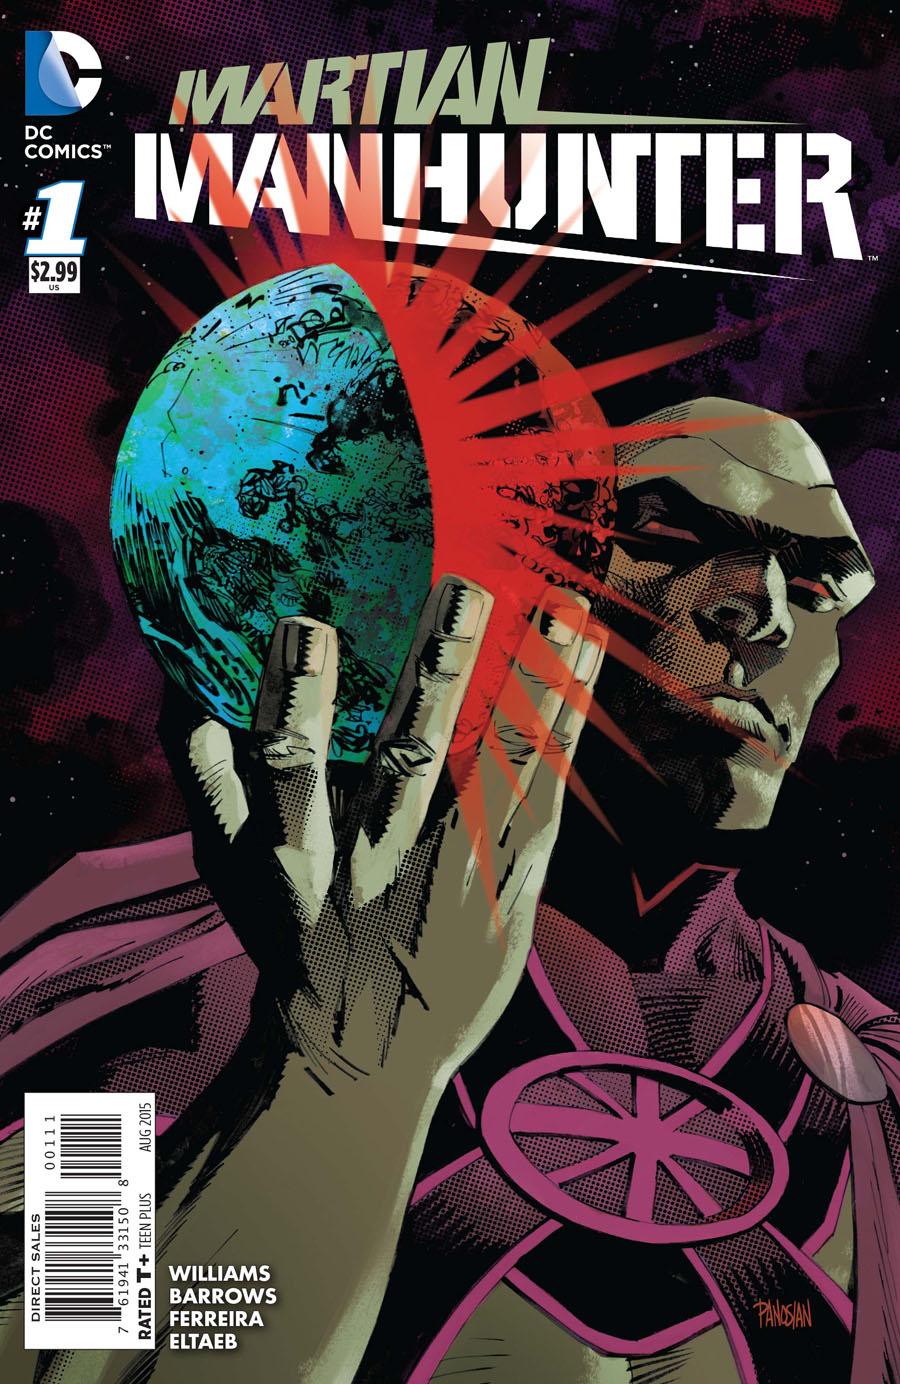 Martian Manhunter Vol 4 #1 Cover A Regular Eddy Barrows & Eber Ferreira Cover